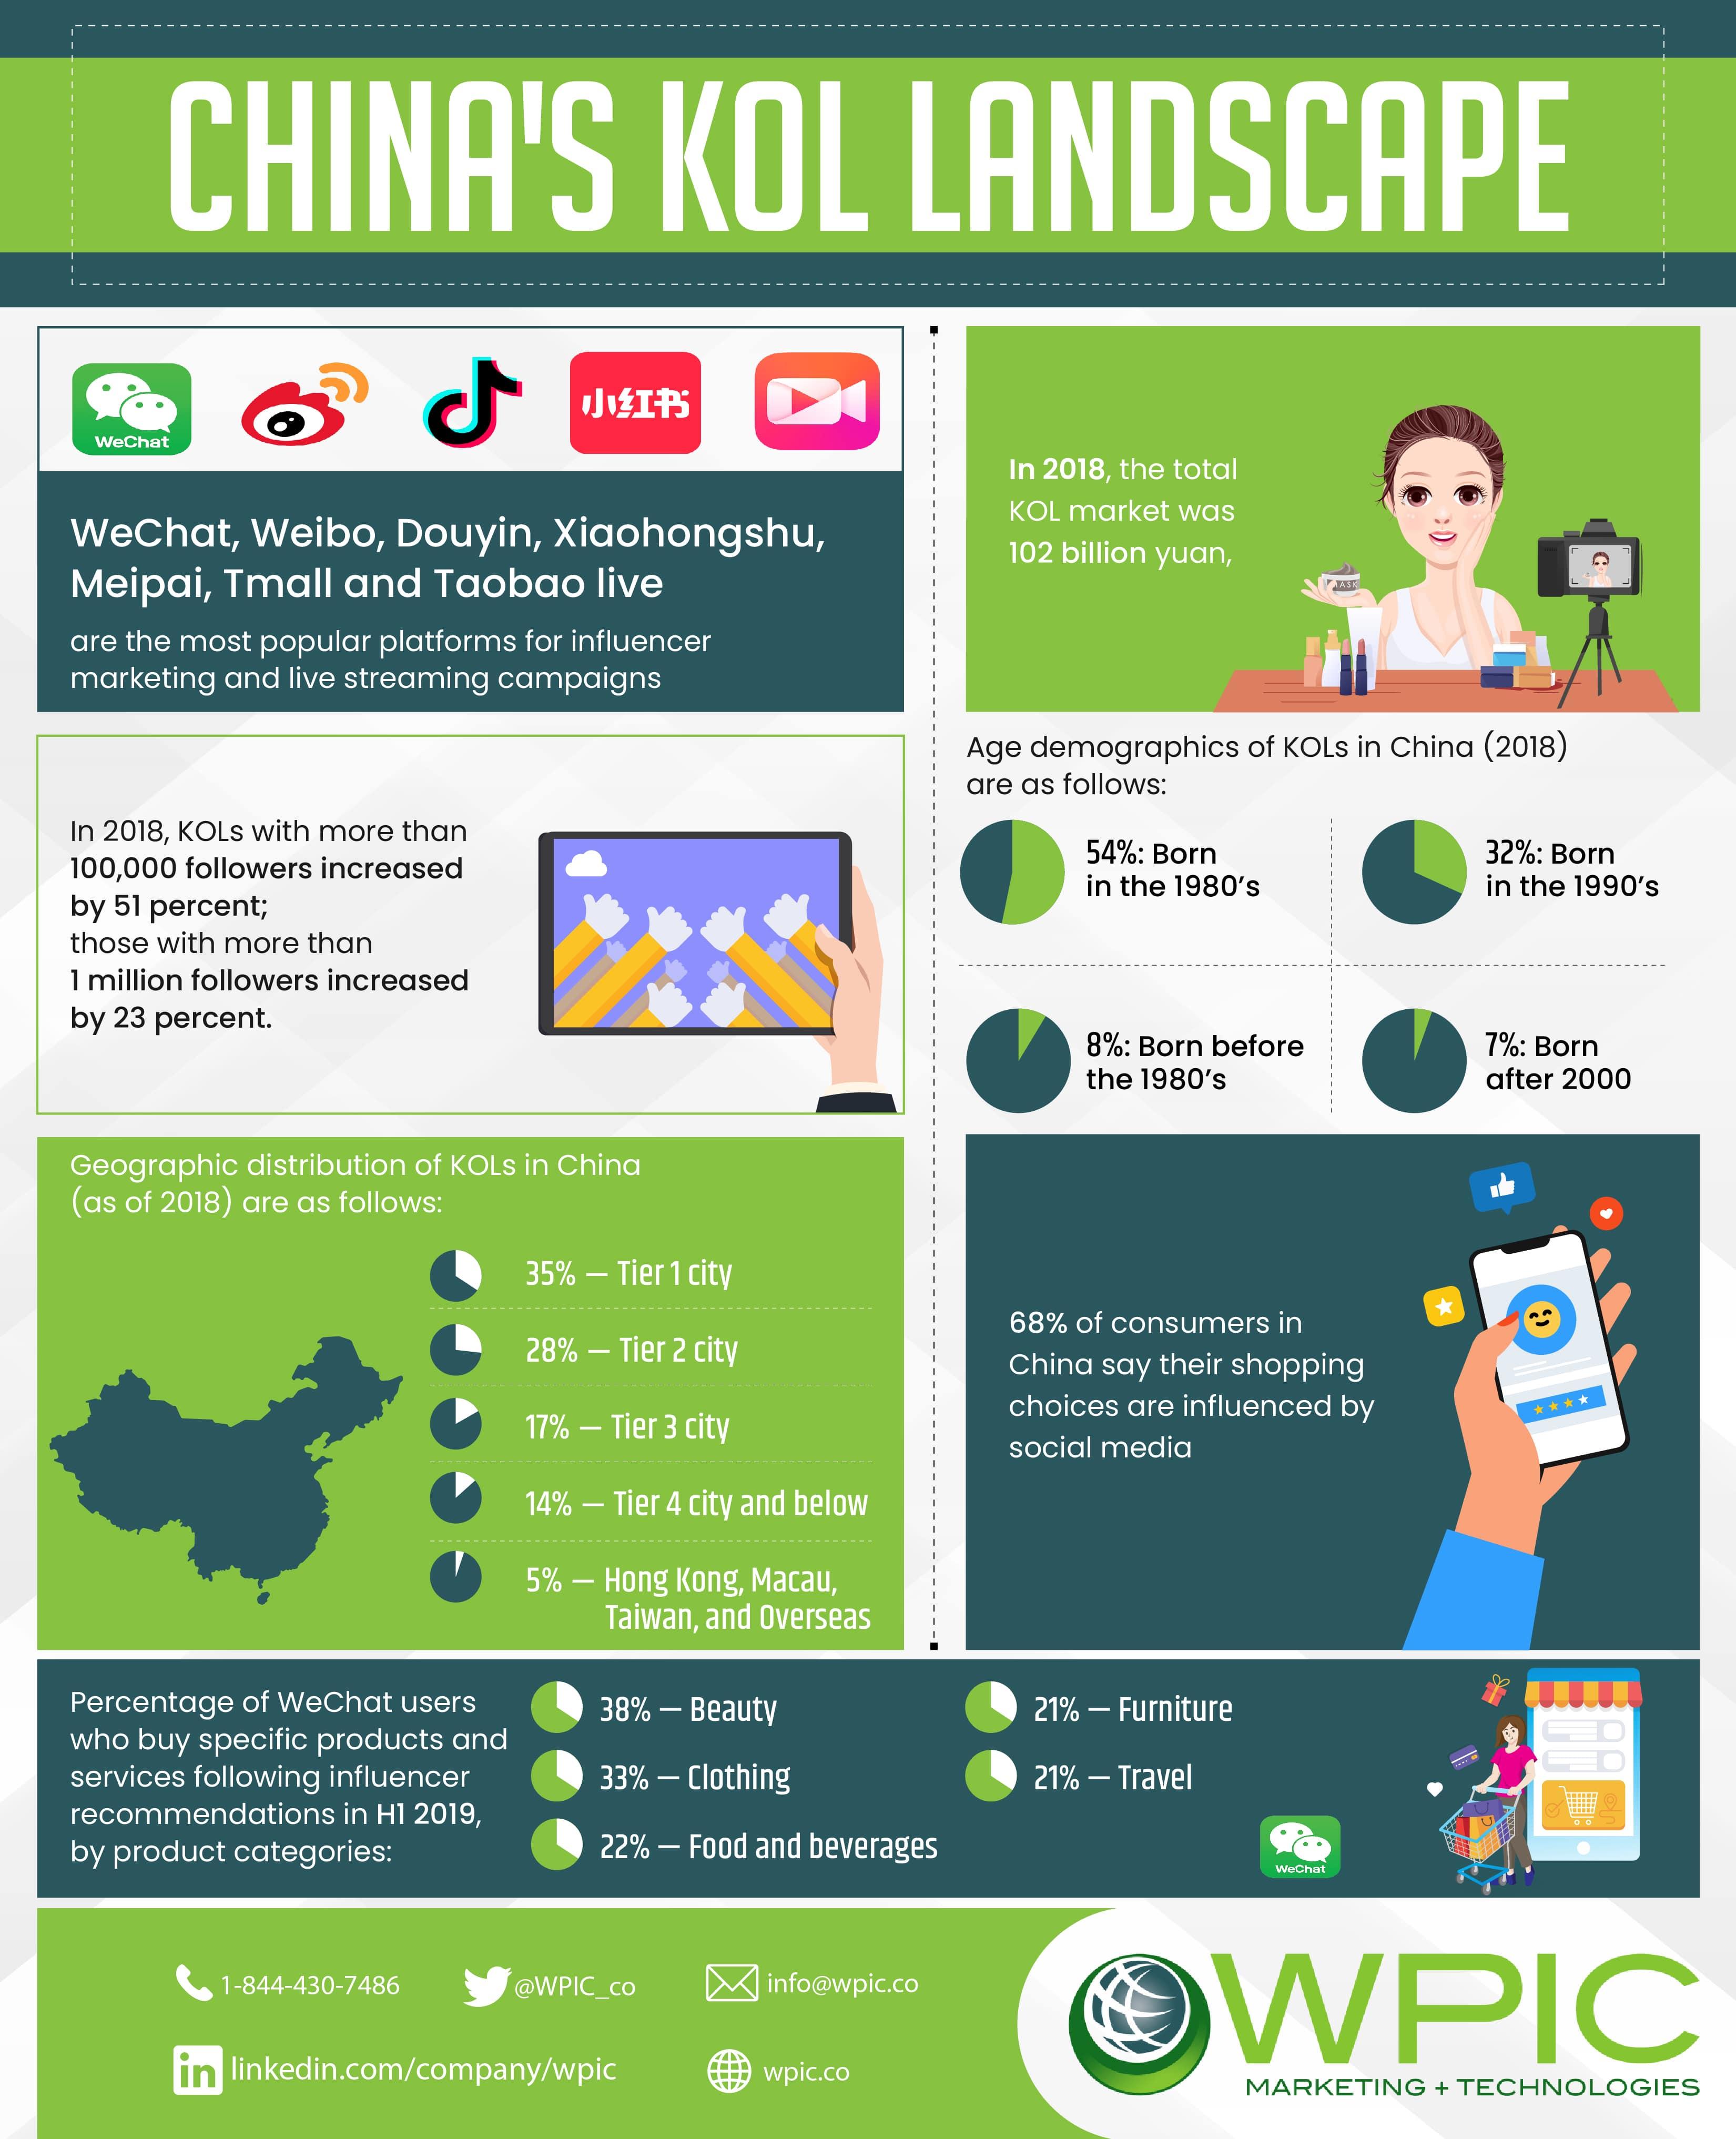 China's KOL landscape infographic